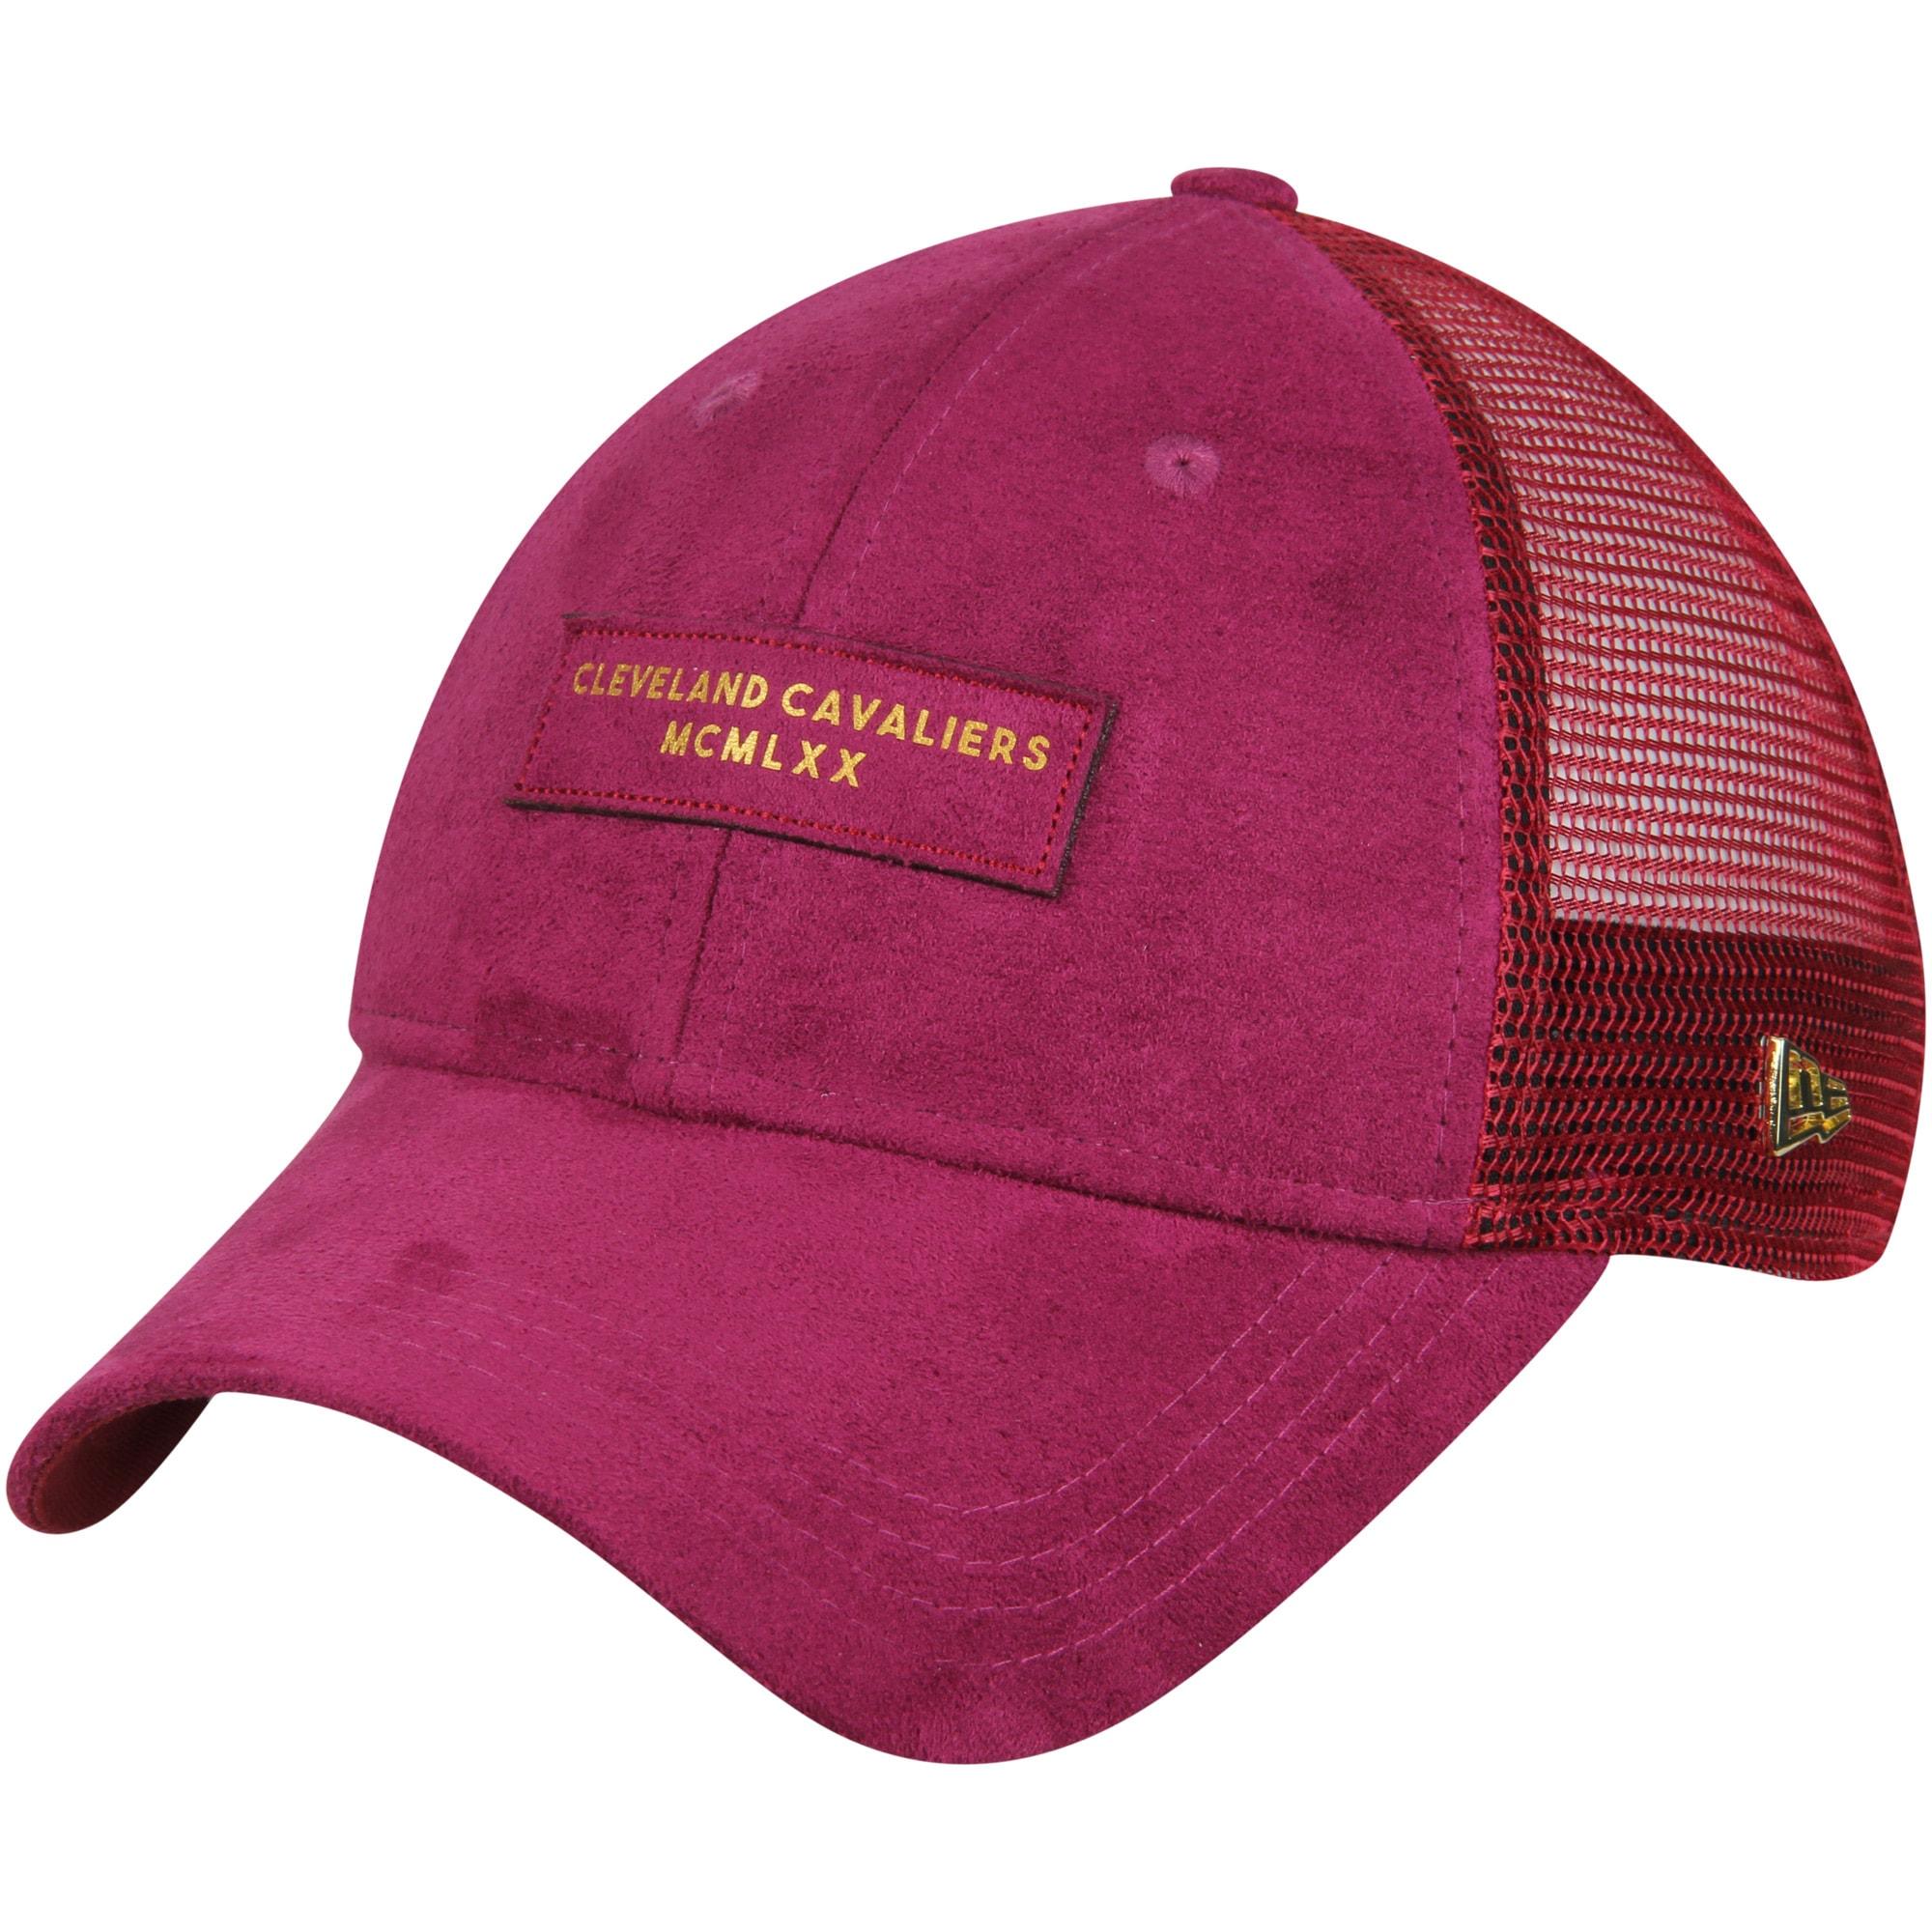 Cleveland Cavaliers New Era Trucker Black Label Series 9TWENTY Adjustable Hat - Wine